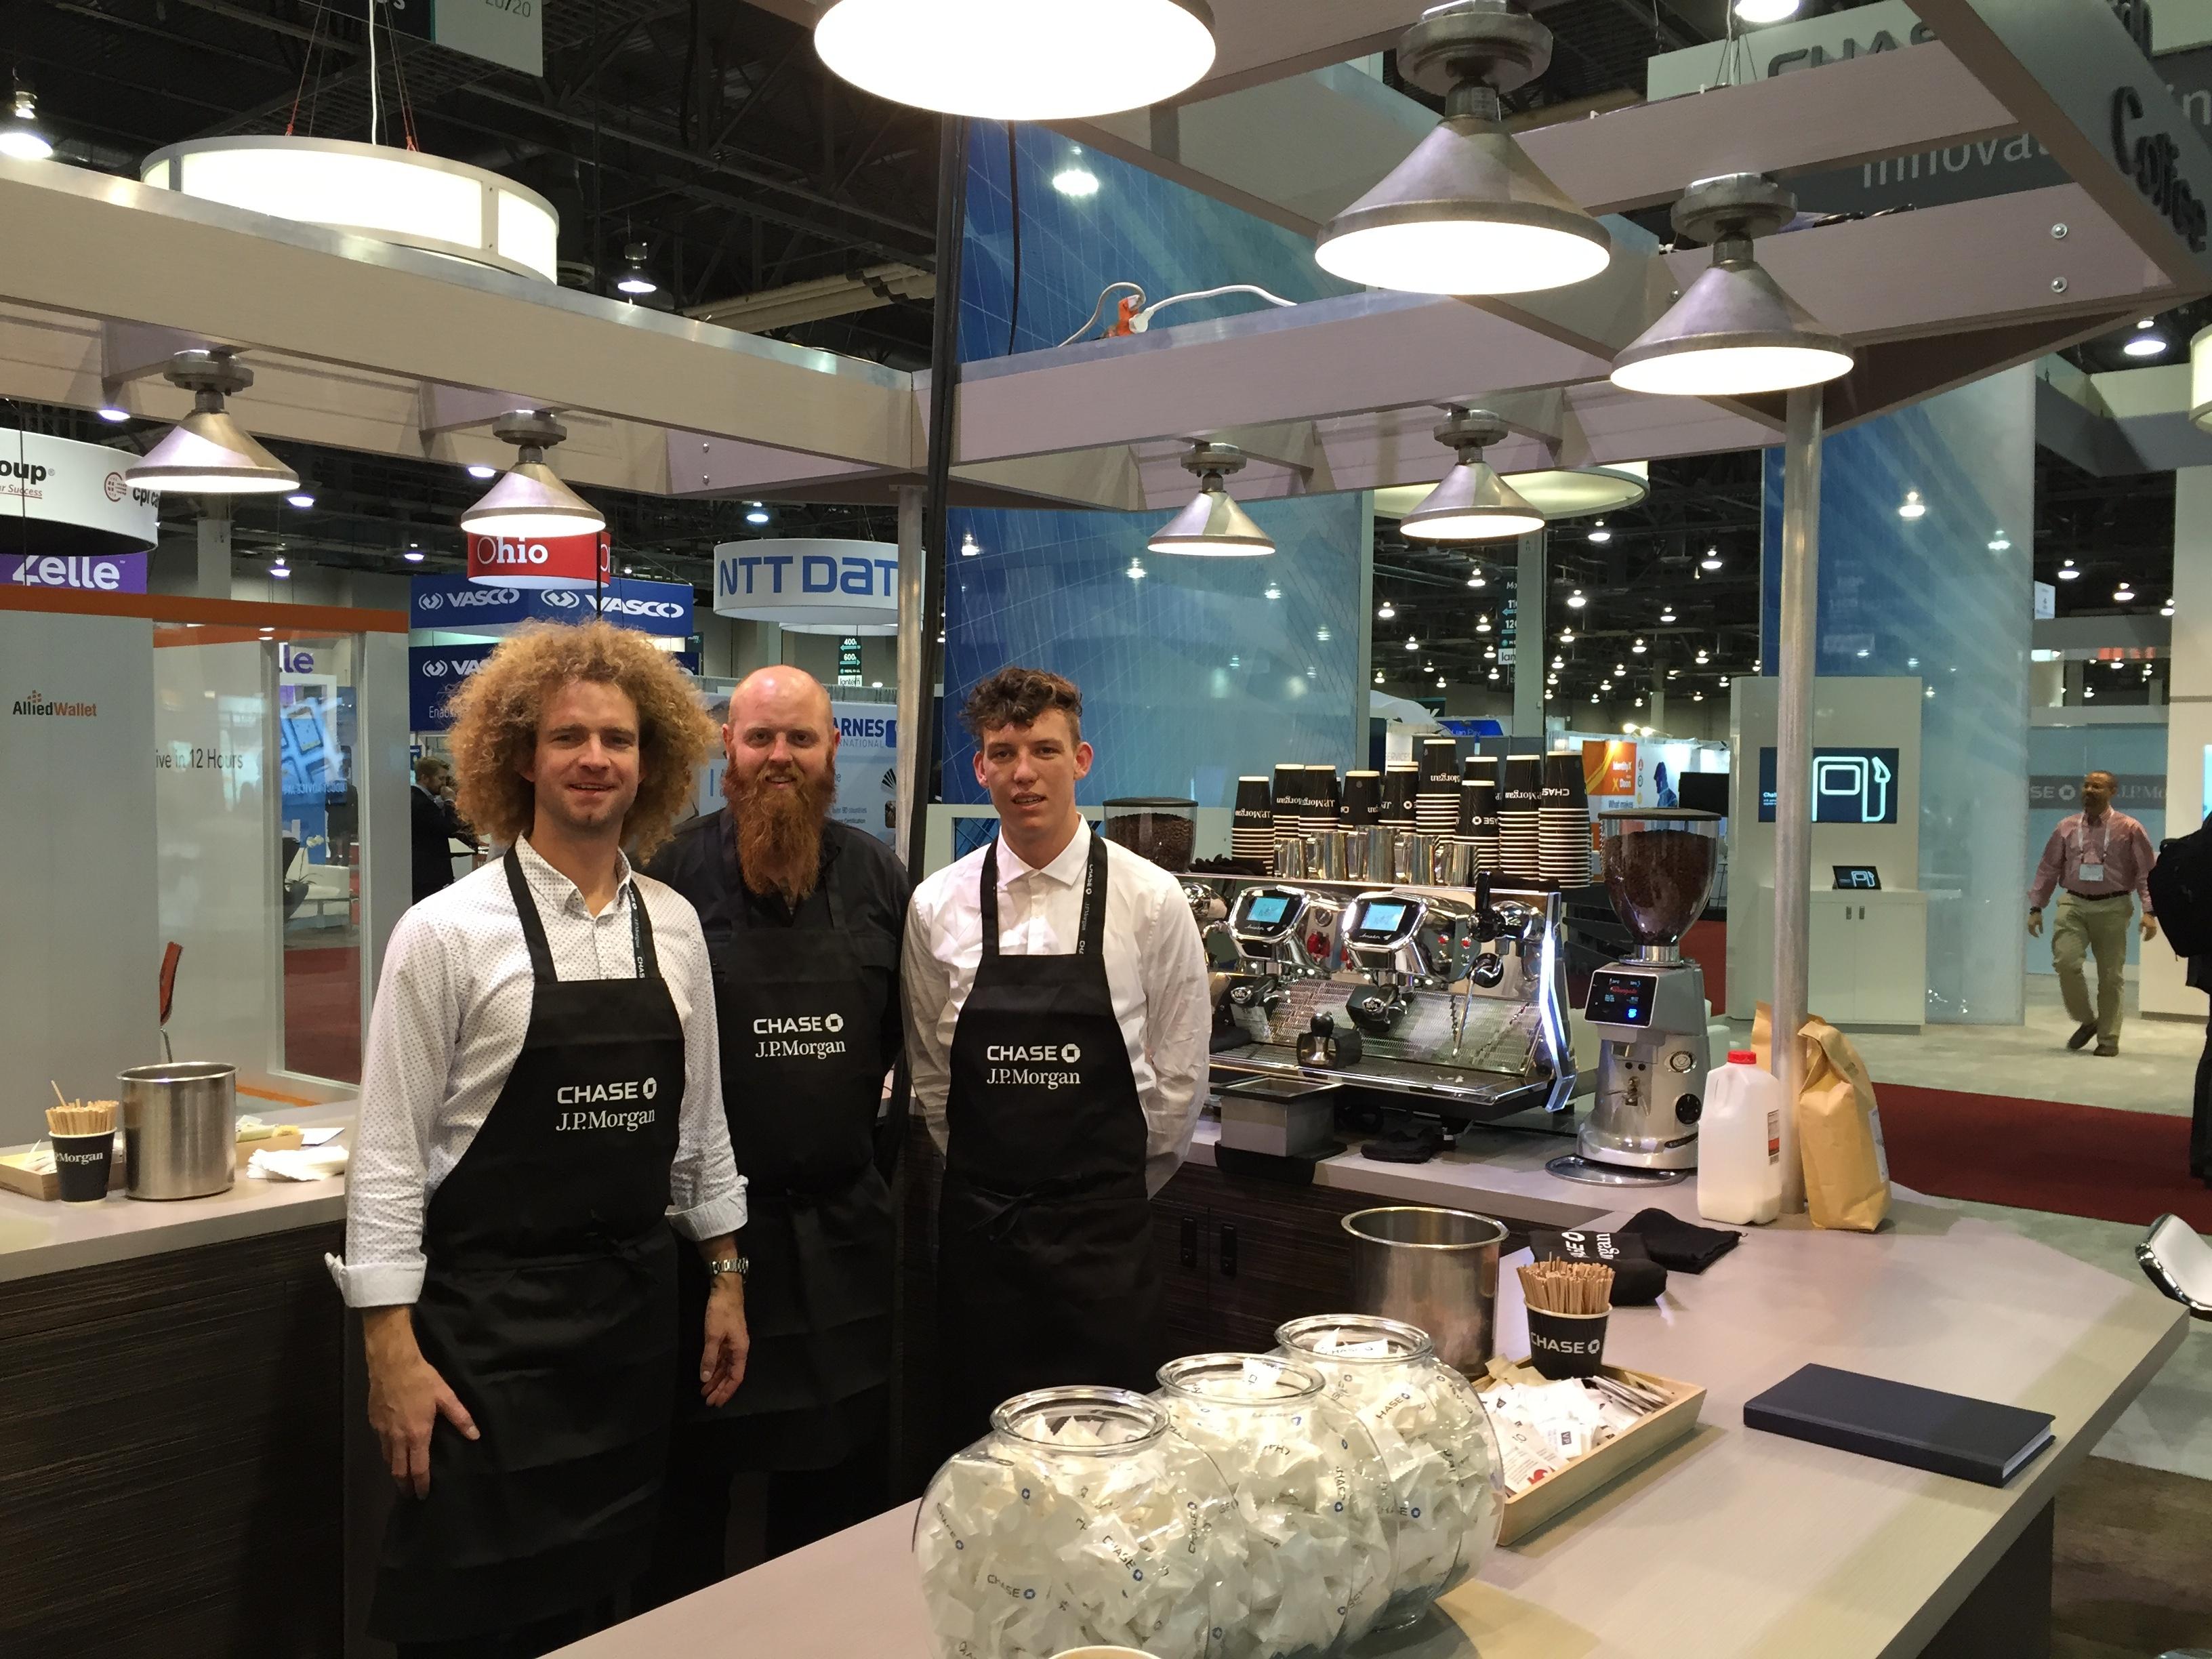 Coffee bar at JP Morgan's stall at a Las Vegas trade fair - Kalles Kaffe